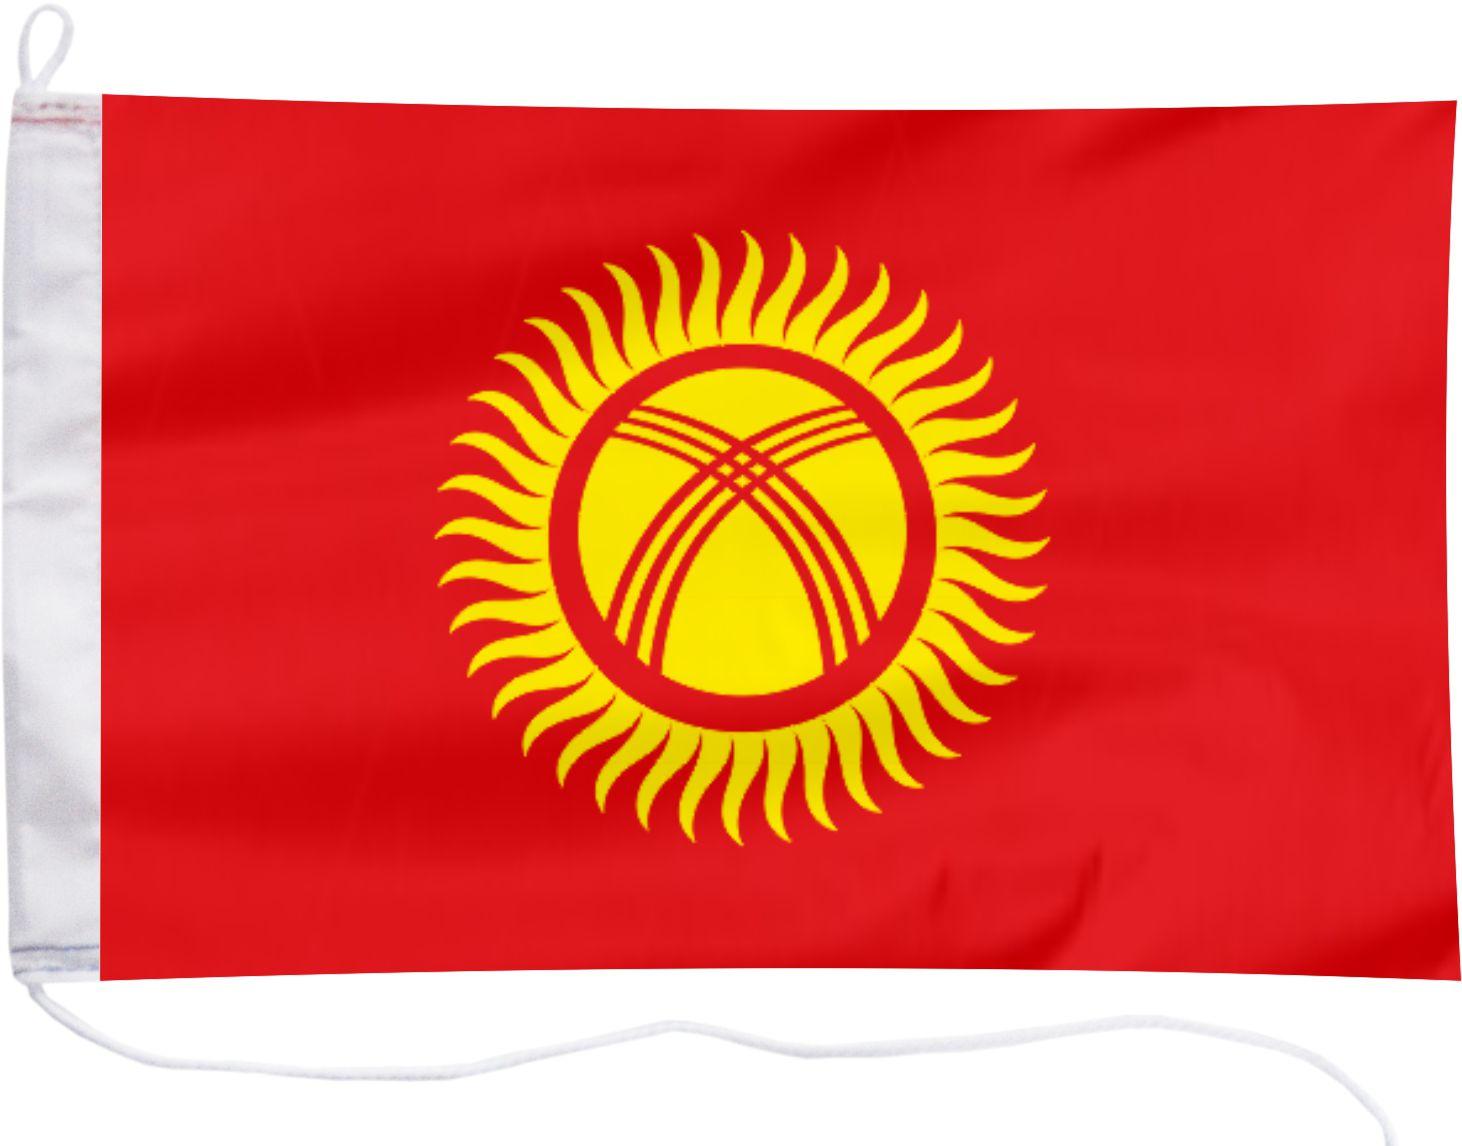 Картинка на фон с флагом россии характере